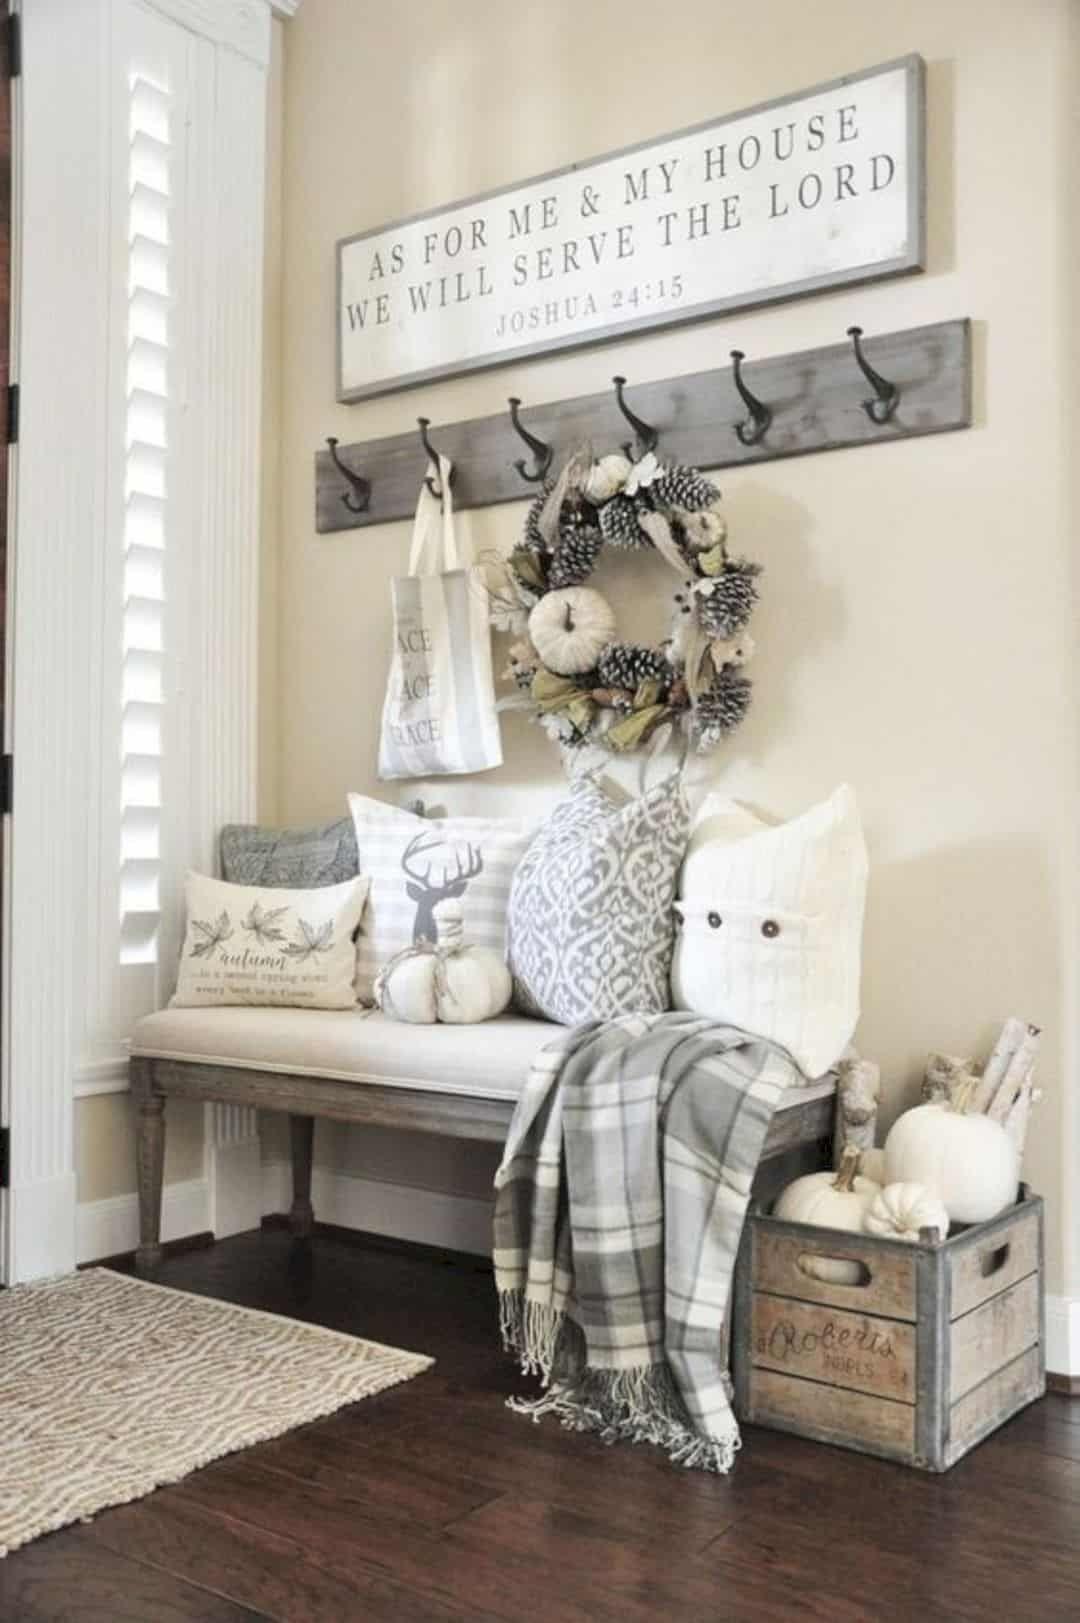 16 Furniture Ideas to Bring Out Farmhouse Flair at Home